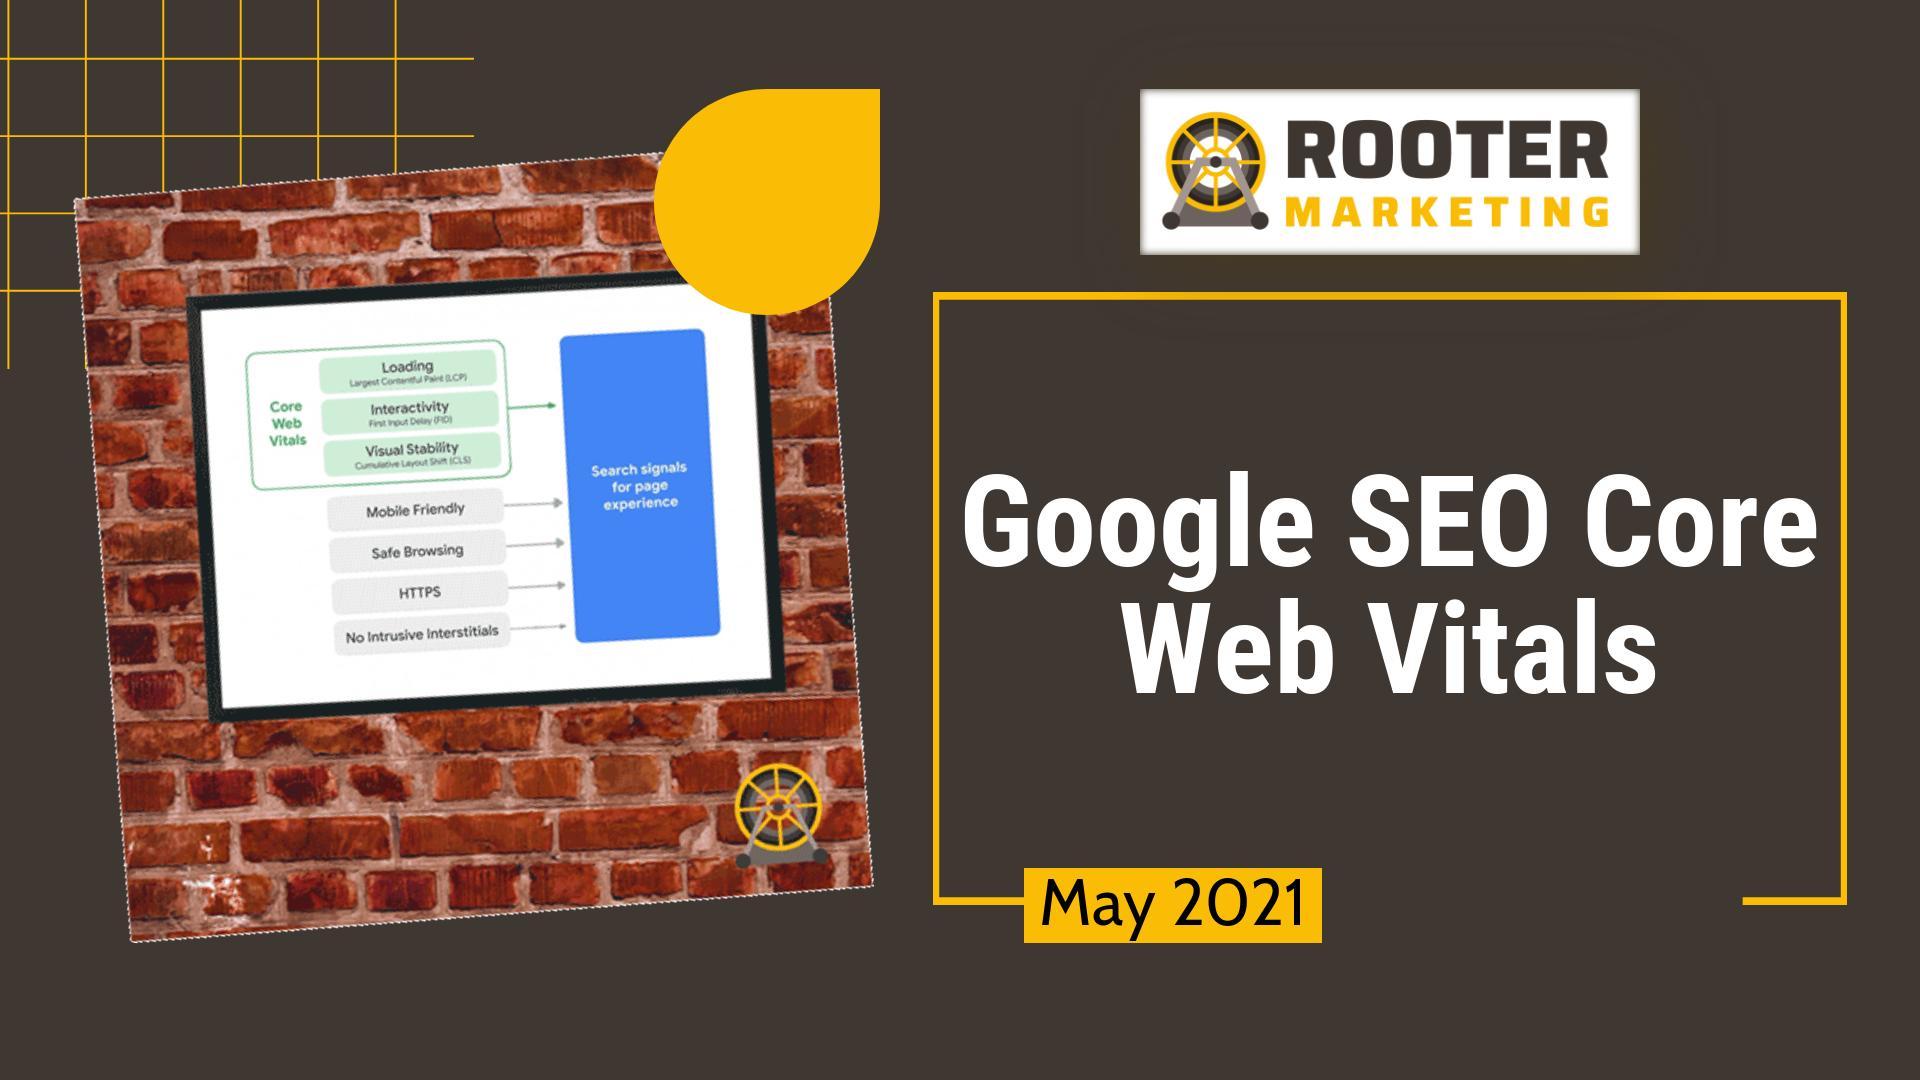 Google SEO Core Web Vitals Rooter Marketing Plumbing SEO